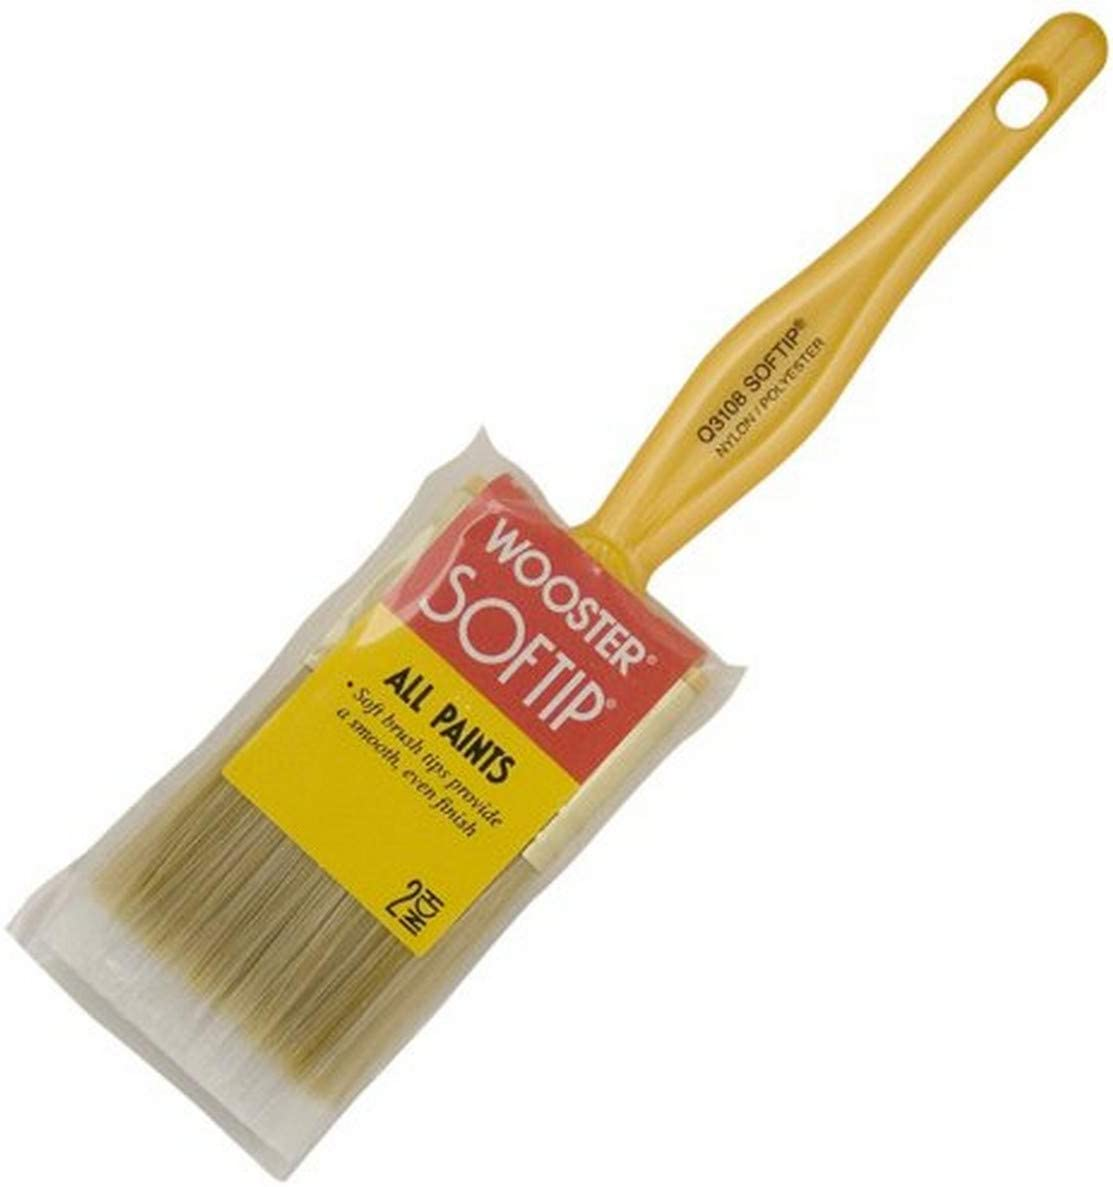 Wooster-Q3108-2-Paint-Brush